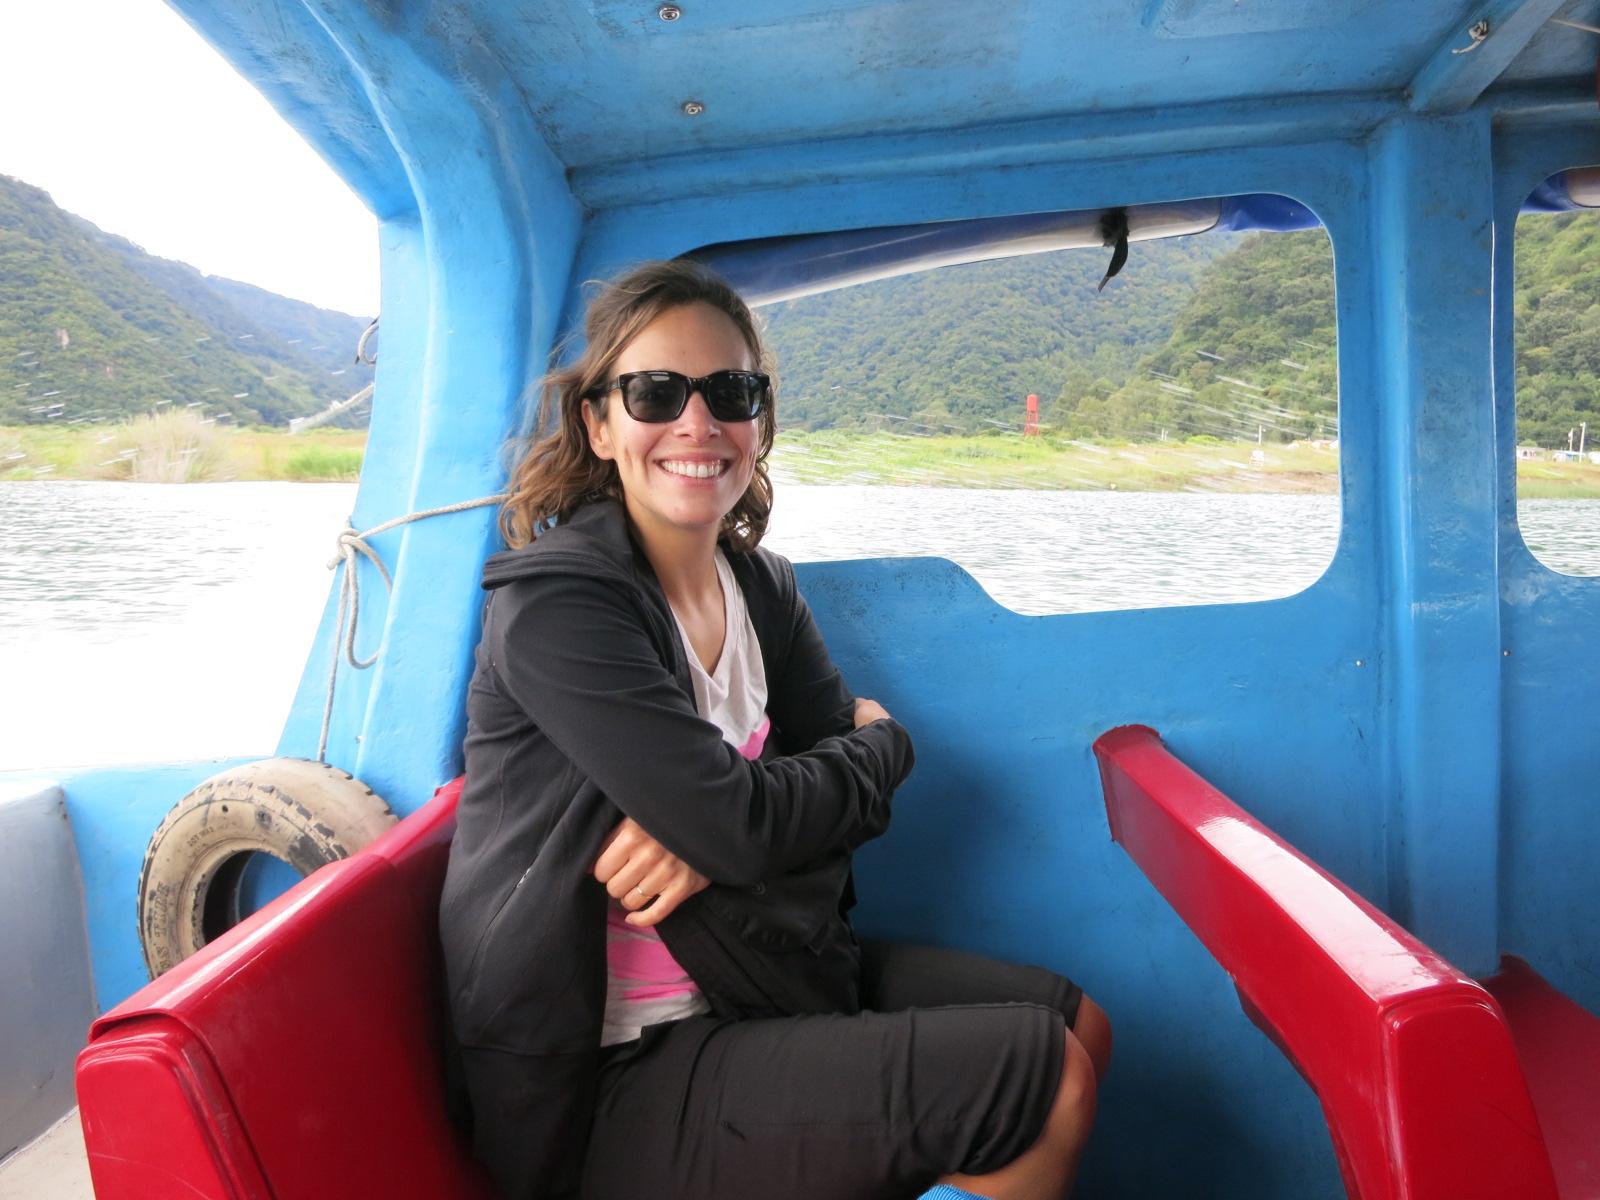 Me loving the boat ride back